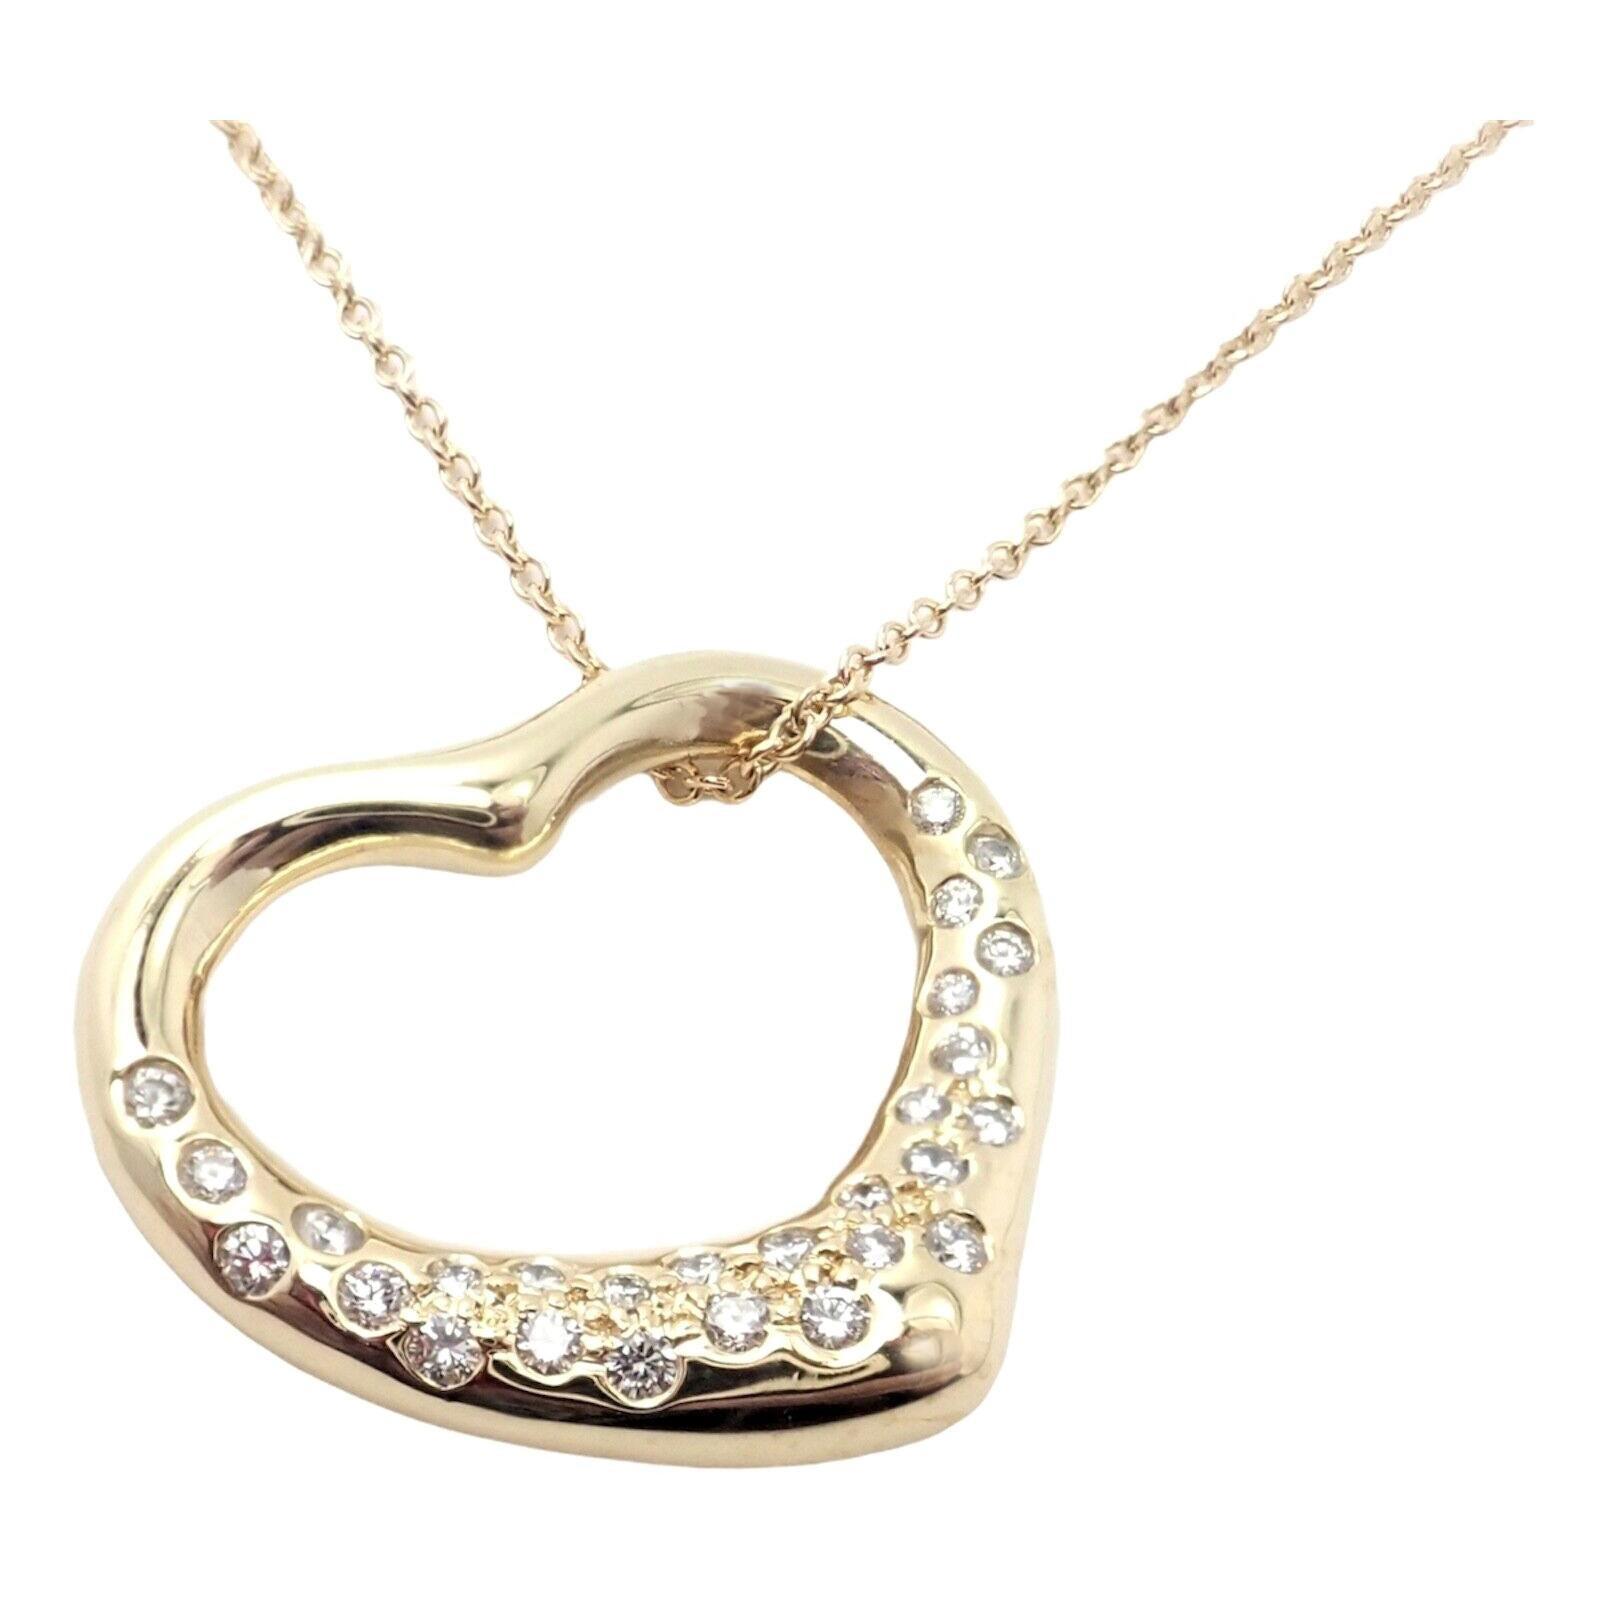 Tiffany & Co. Elsa Peretti Diamond Open Heart Yellow Gold Necklace